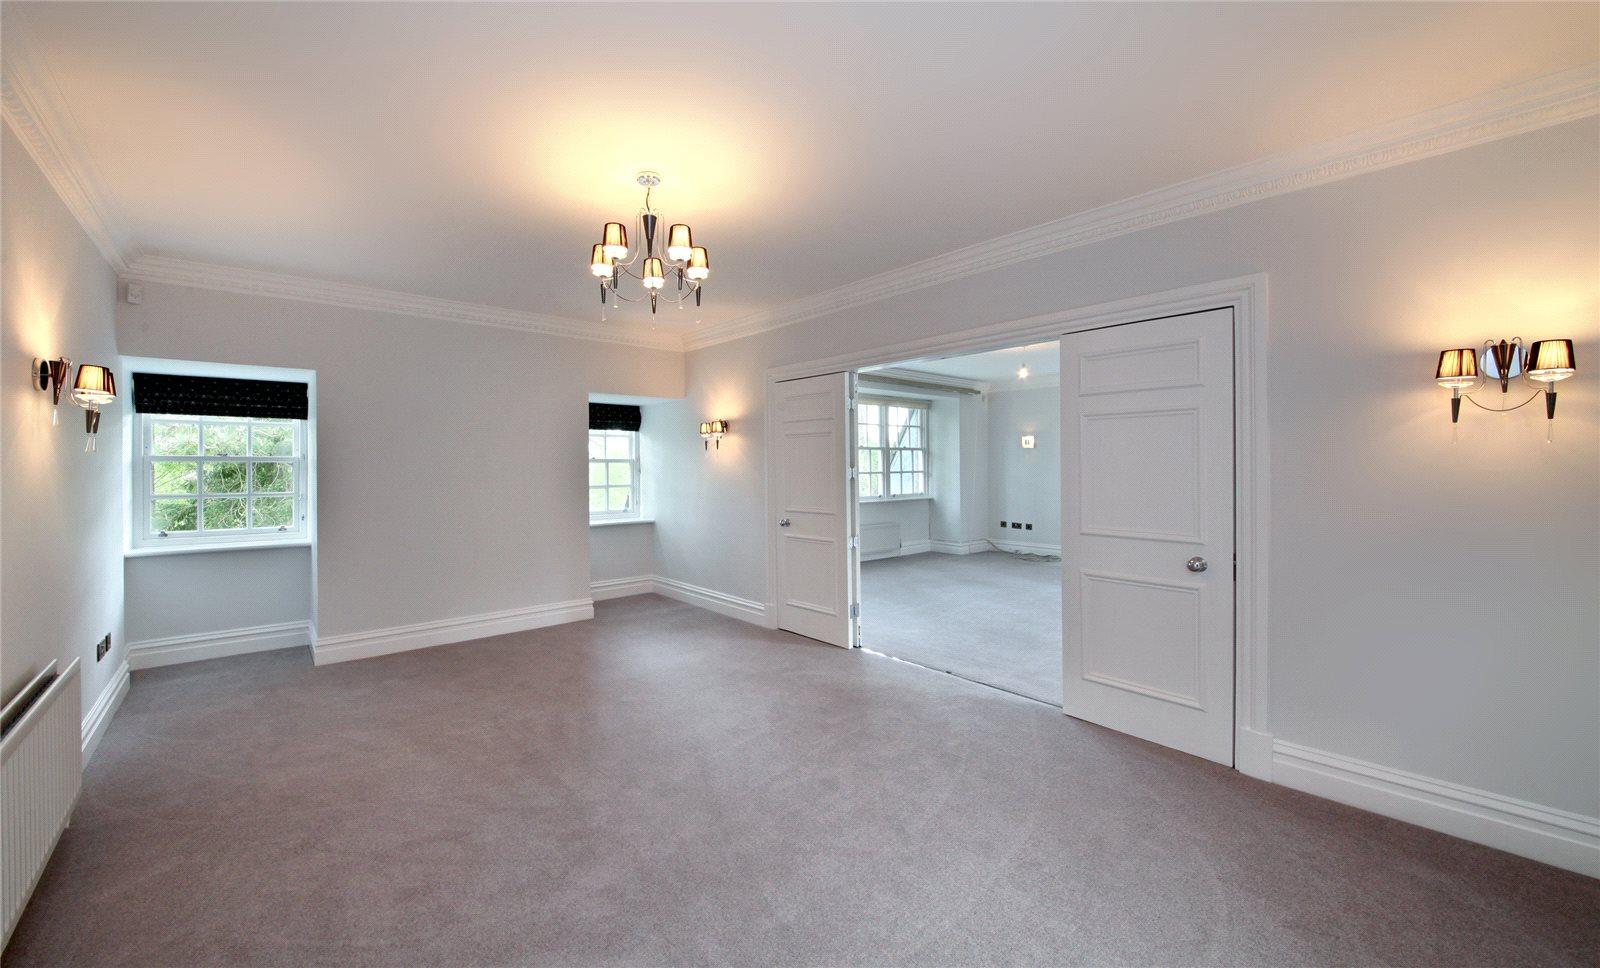 Additional photo for property listing at Turnberry House, Cross Road, Sunningdale, Berkshire, SL5 Sunningdale, Ingiltere